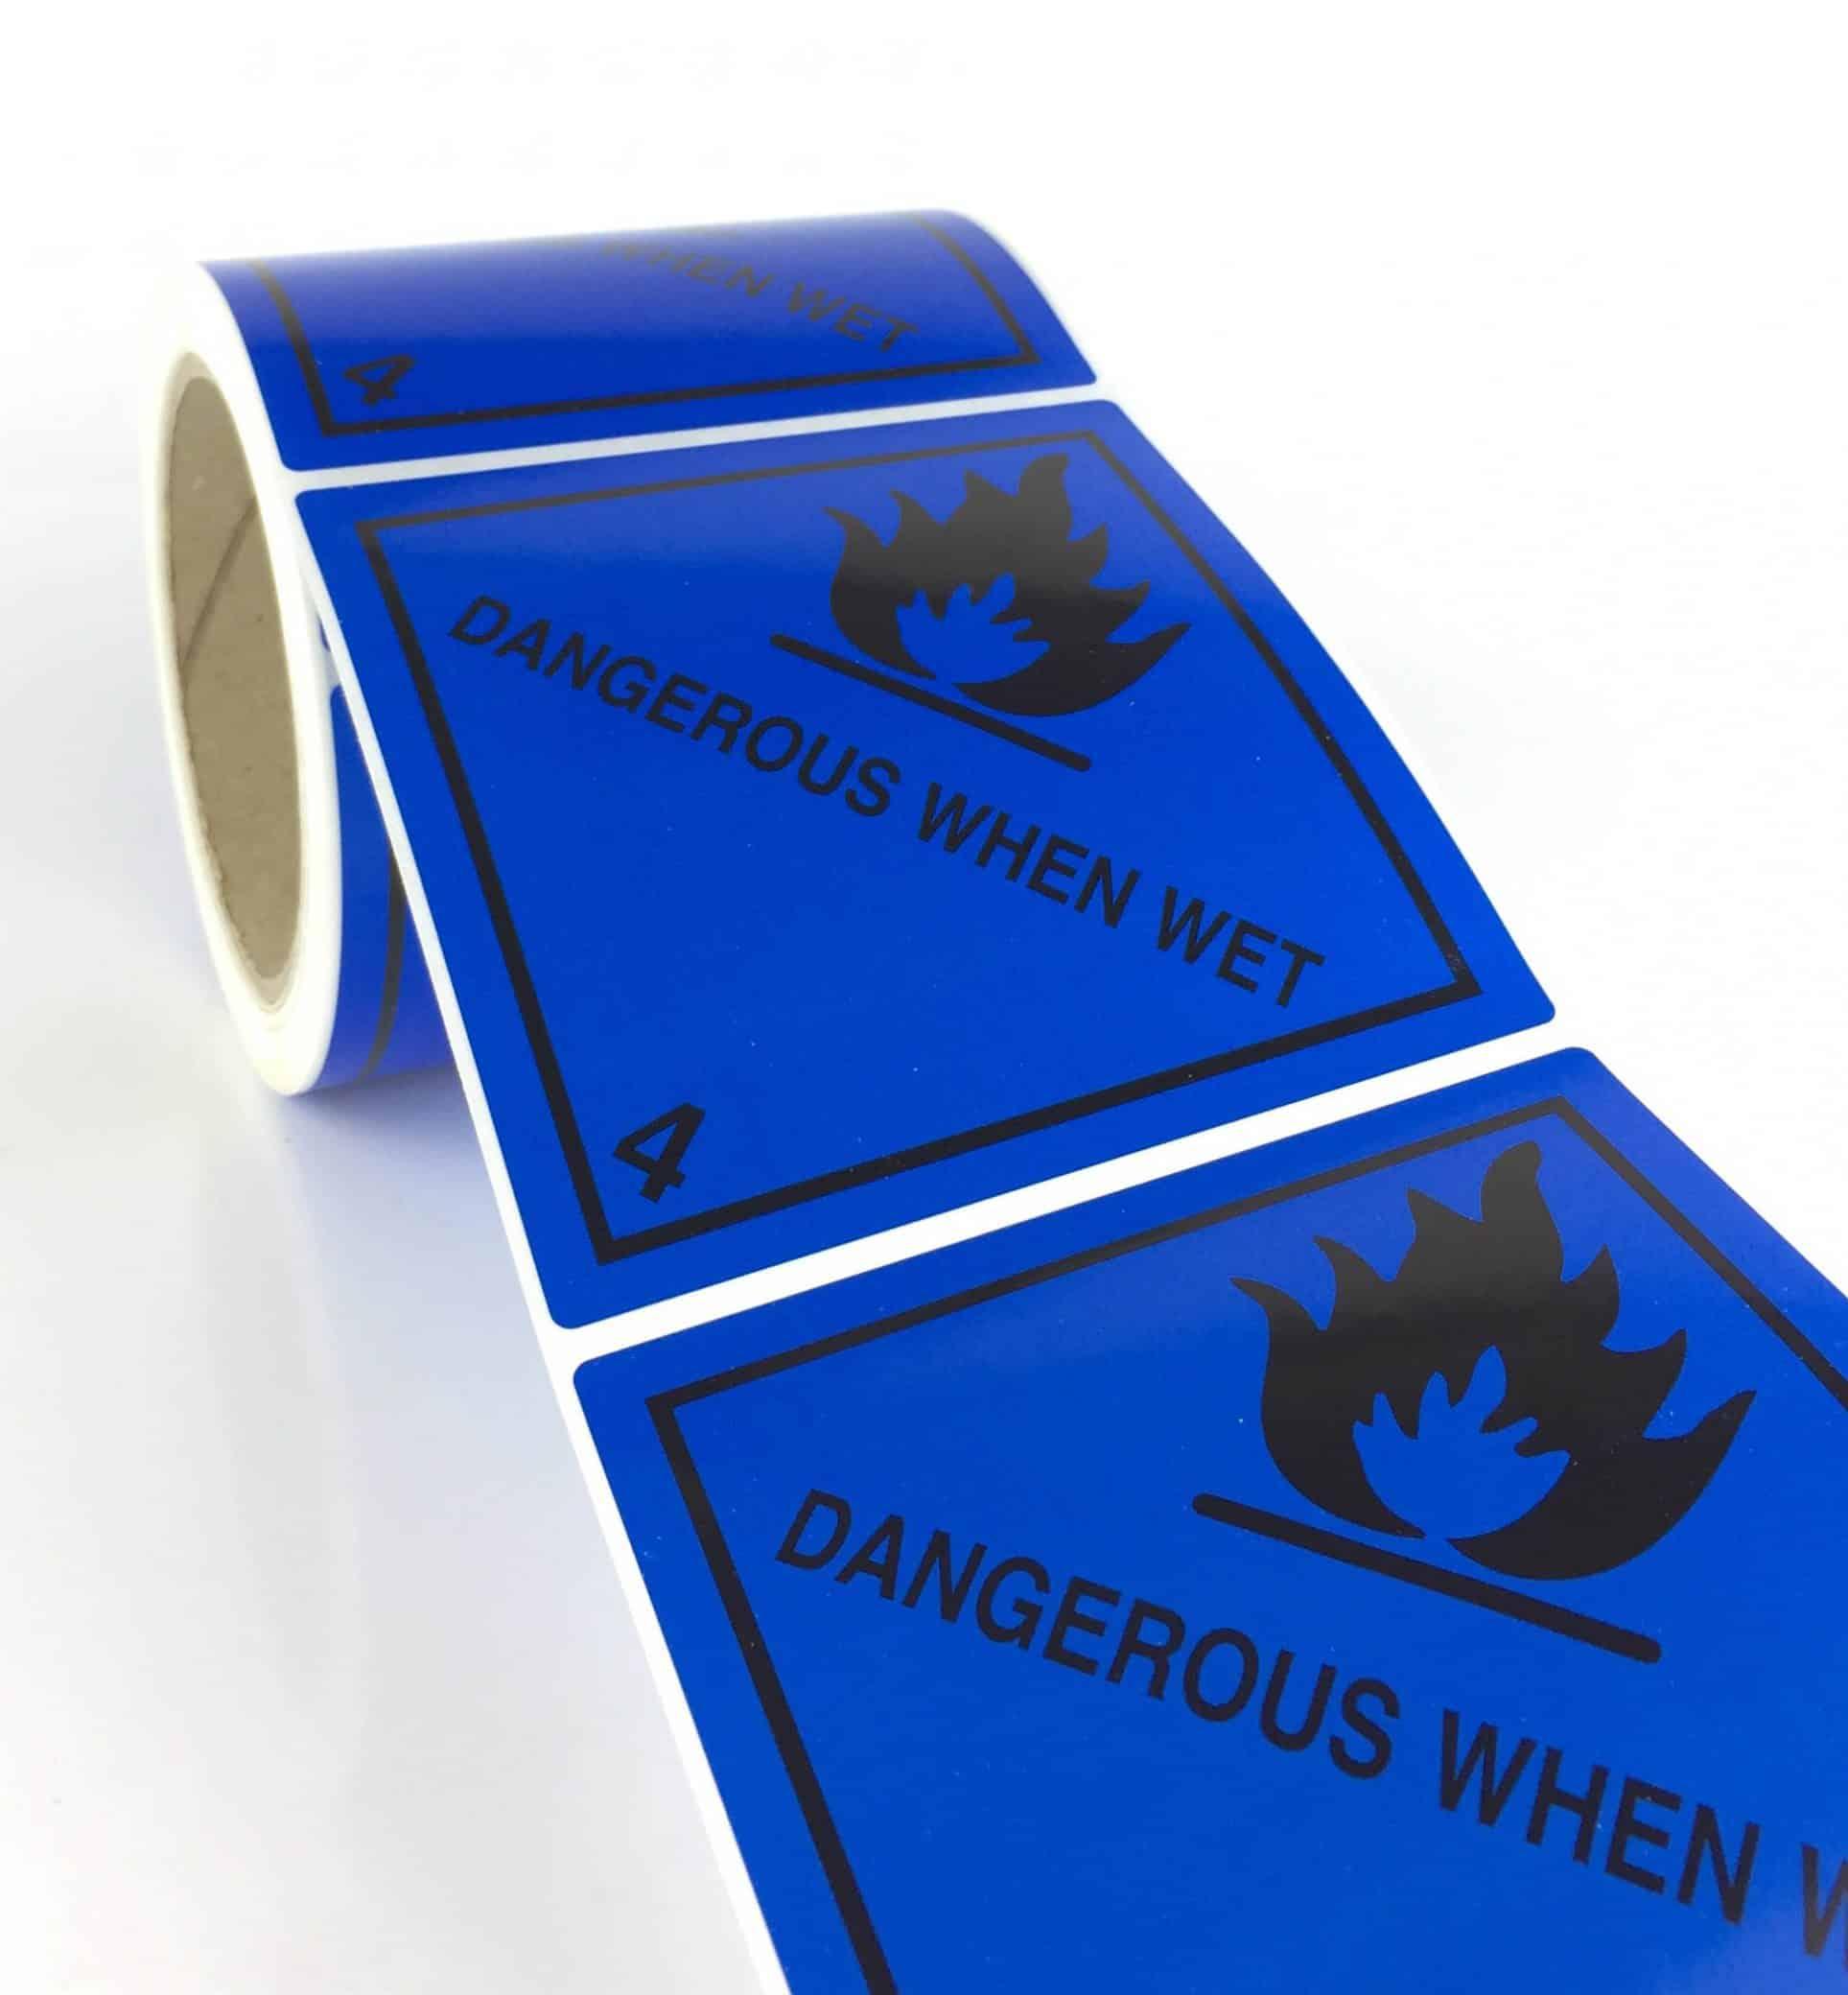 Class 4.3 Labels. Dangerous When Wet 100mm X 100mm (Rolls